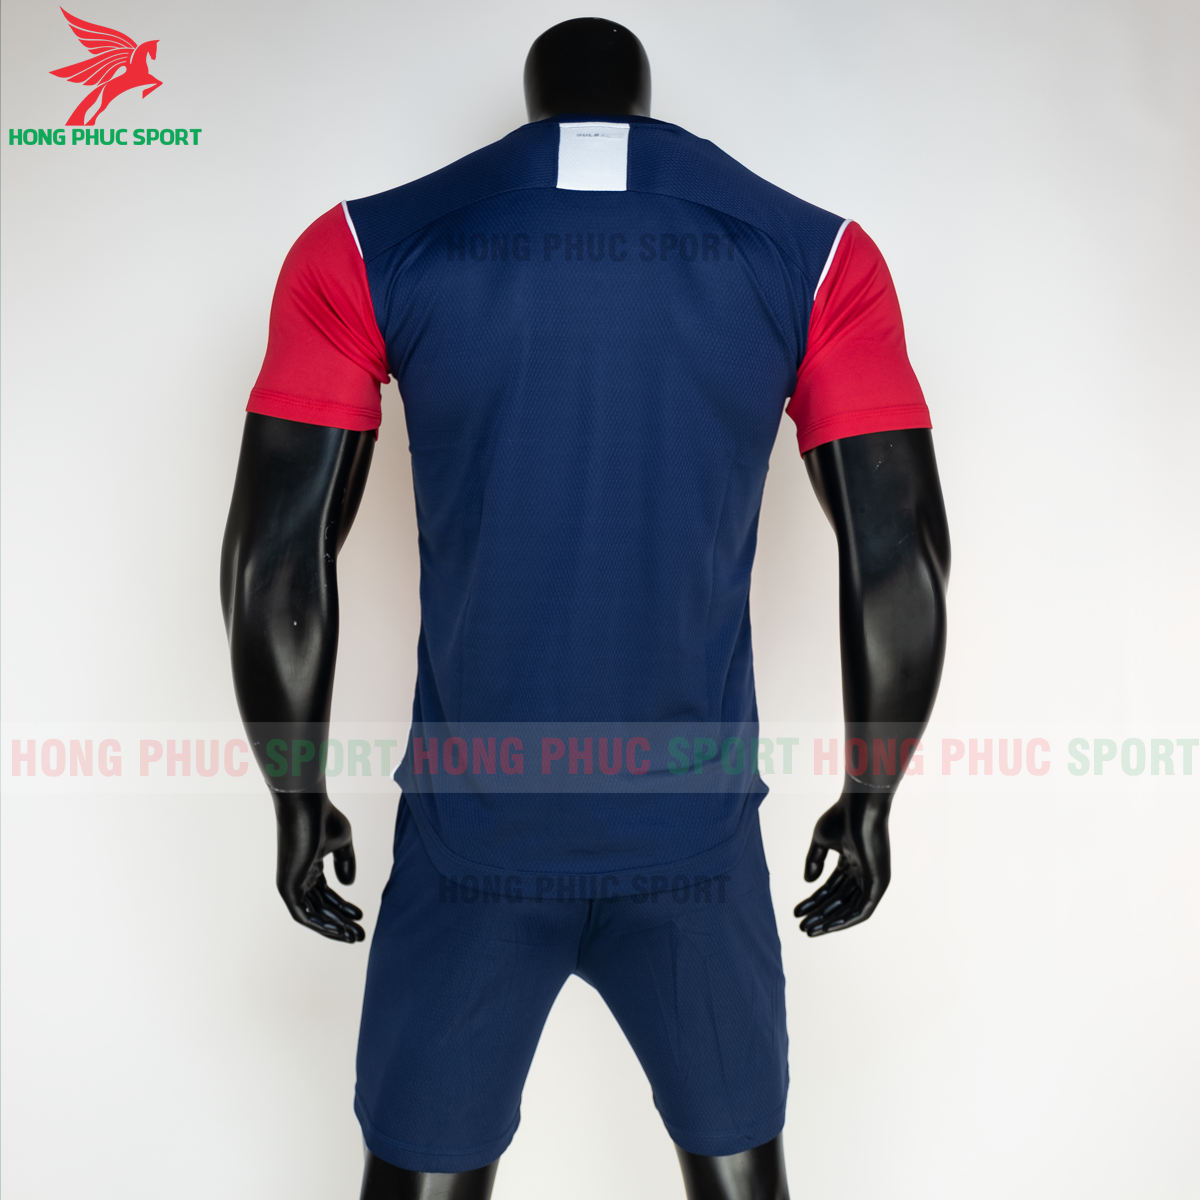 https://cdn.hongphucsport.com/unsafe/s4.shopbay.vn/files/285/ao-bong-da-khong-logo-bulbal-hades-mau-do-8-604f2f513a3c8.png